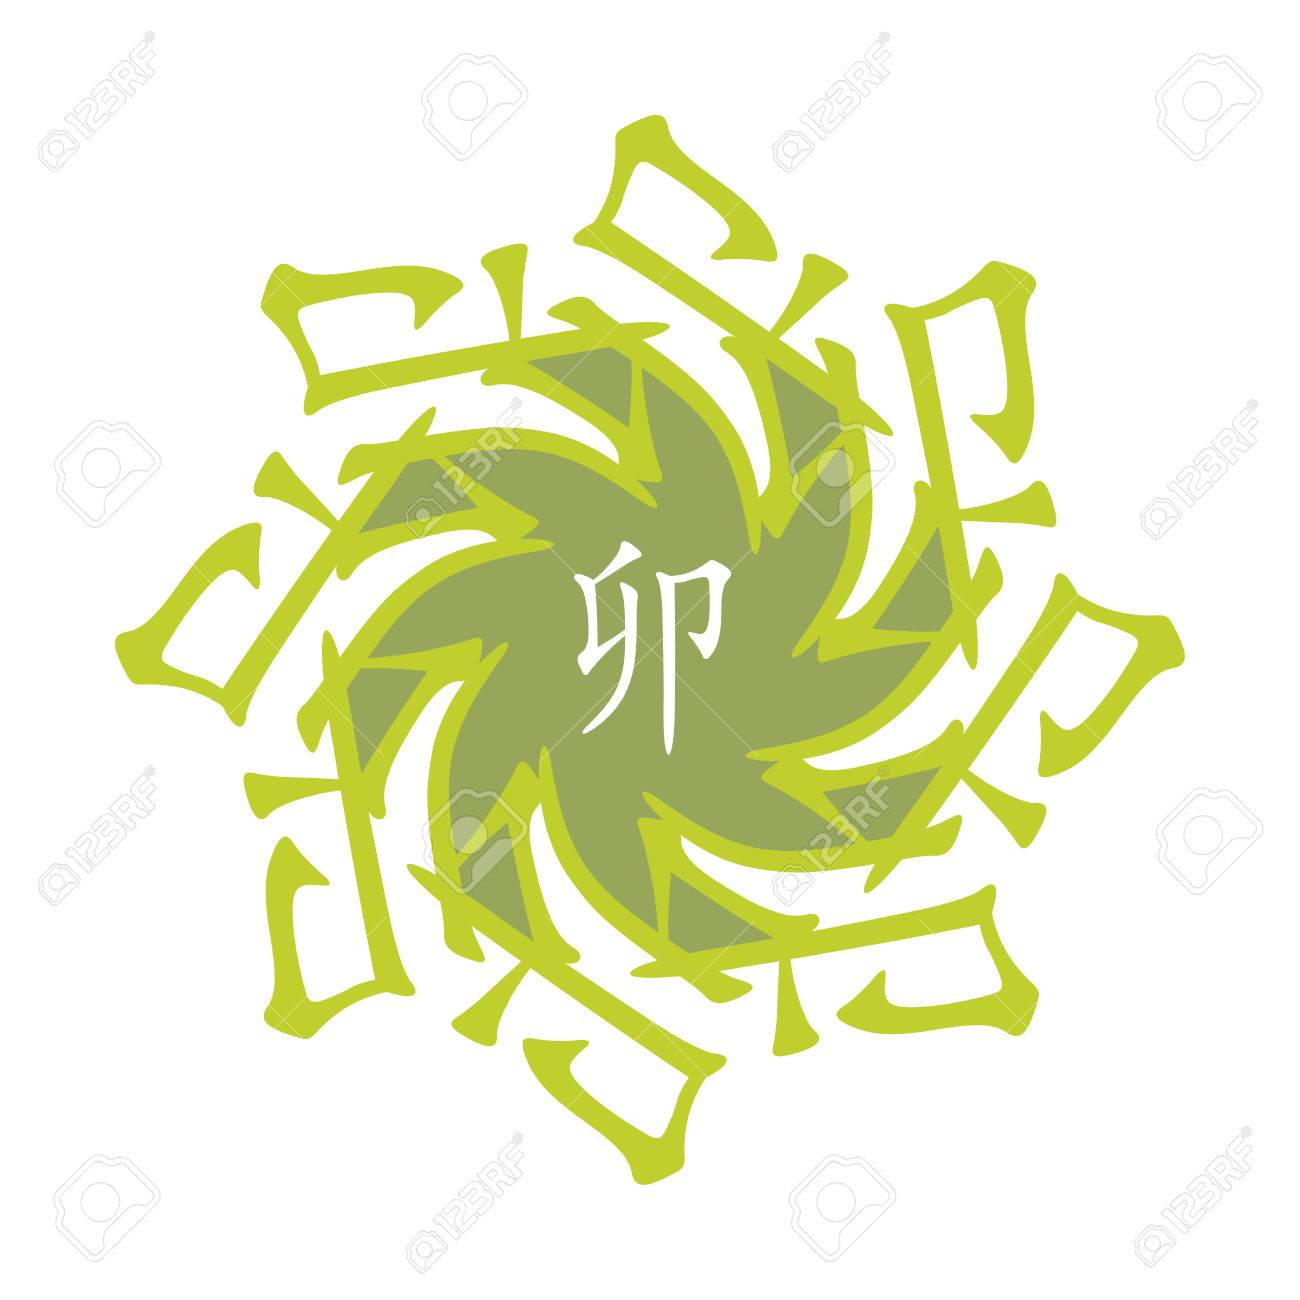 Symbol from chinese hieroglyphs translation of 12 zodiac animals symbol from chinese hieroglyphs translation of 12 zodiac animals branch feng shui signs hieroglyph buycottarizona Images